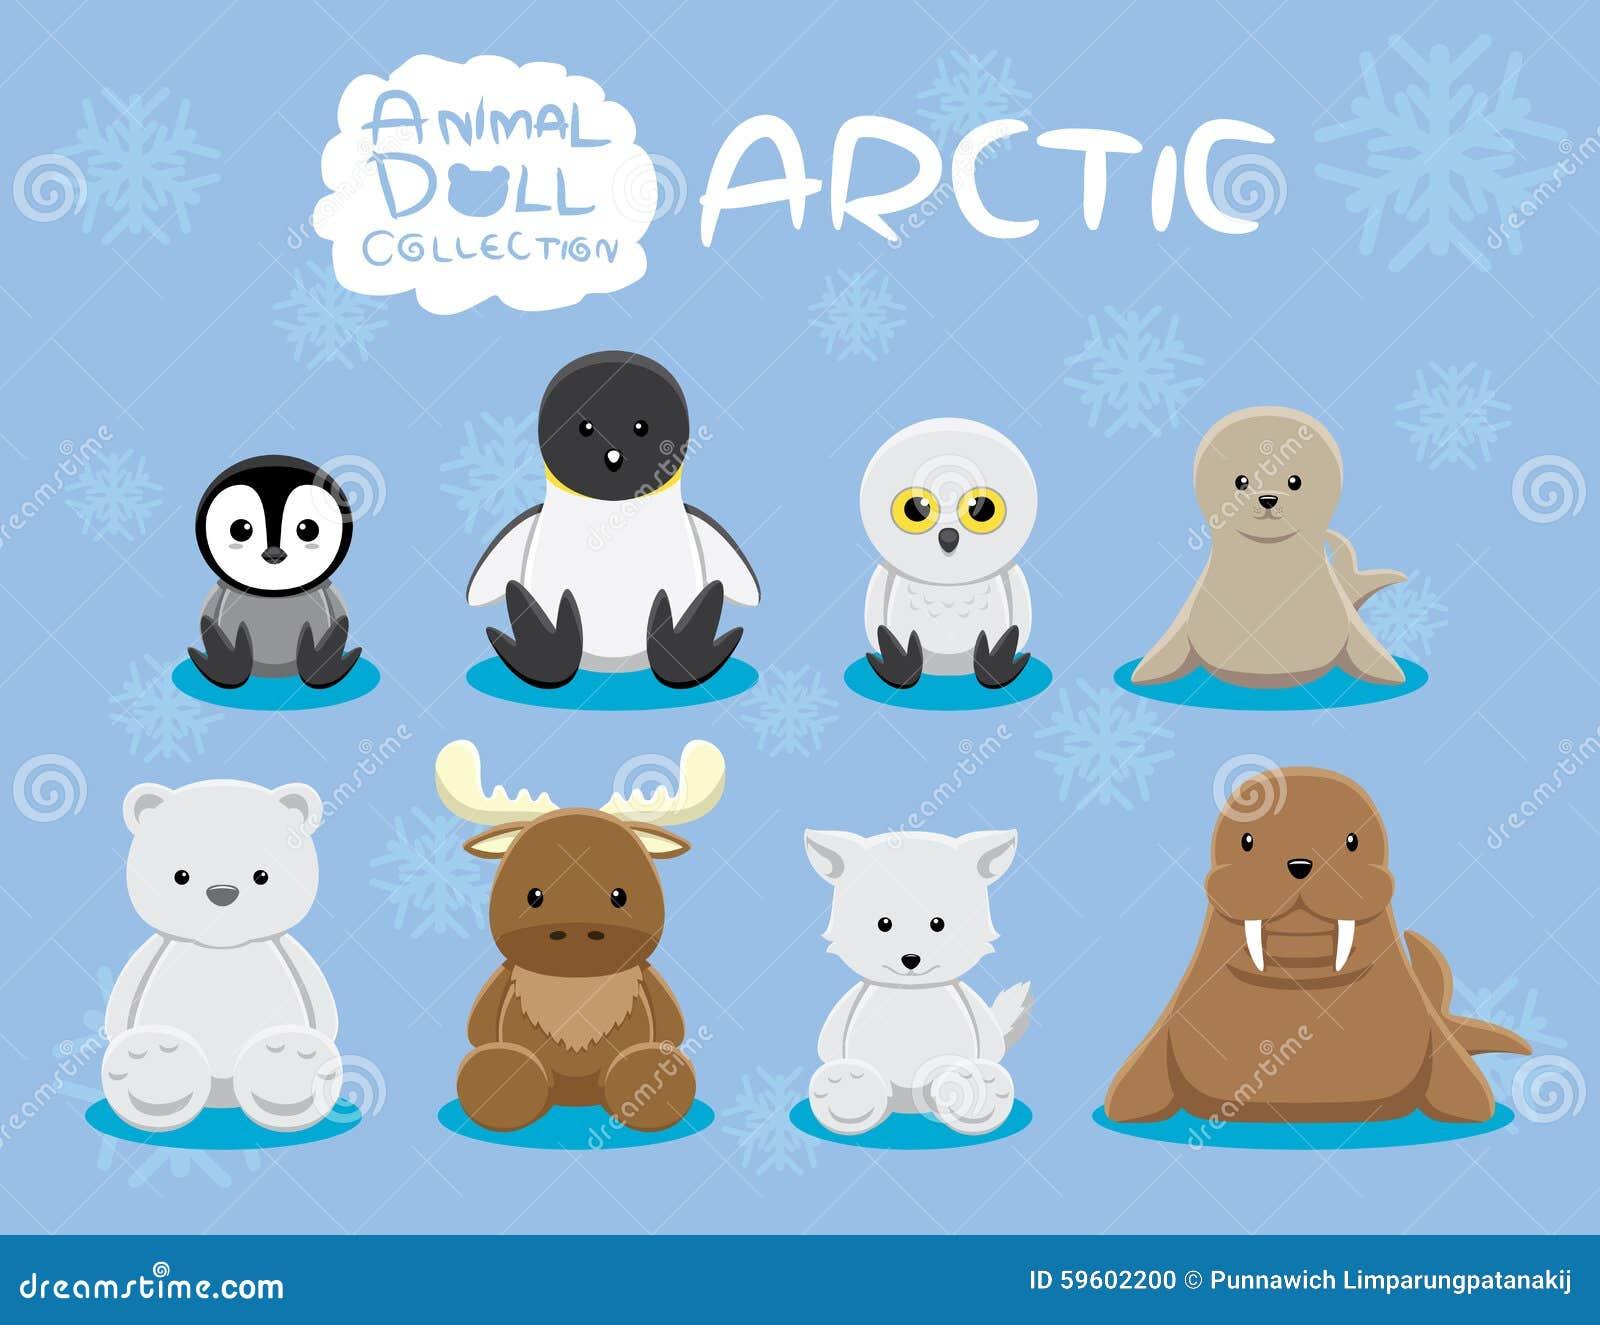 Animal Dolls Arctic Set Cartoon Vector Illustration Stock